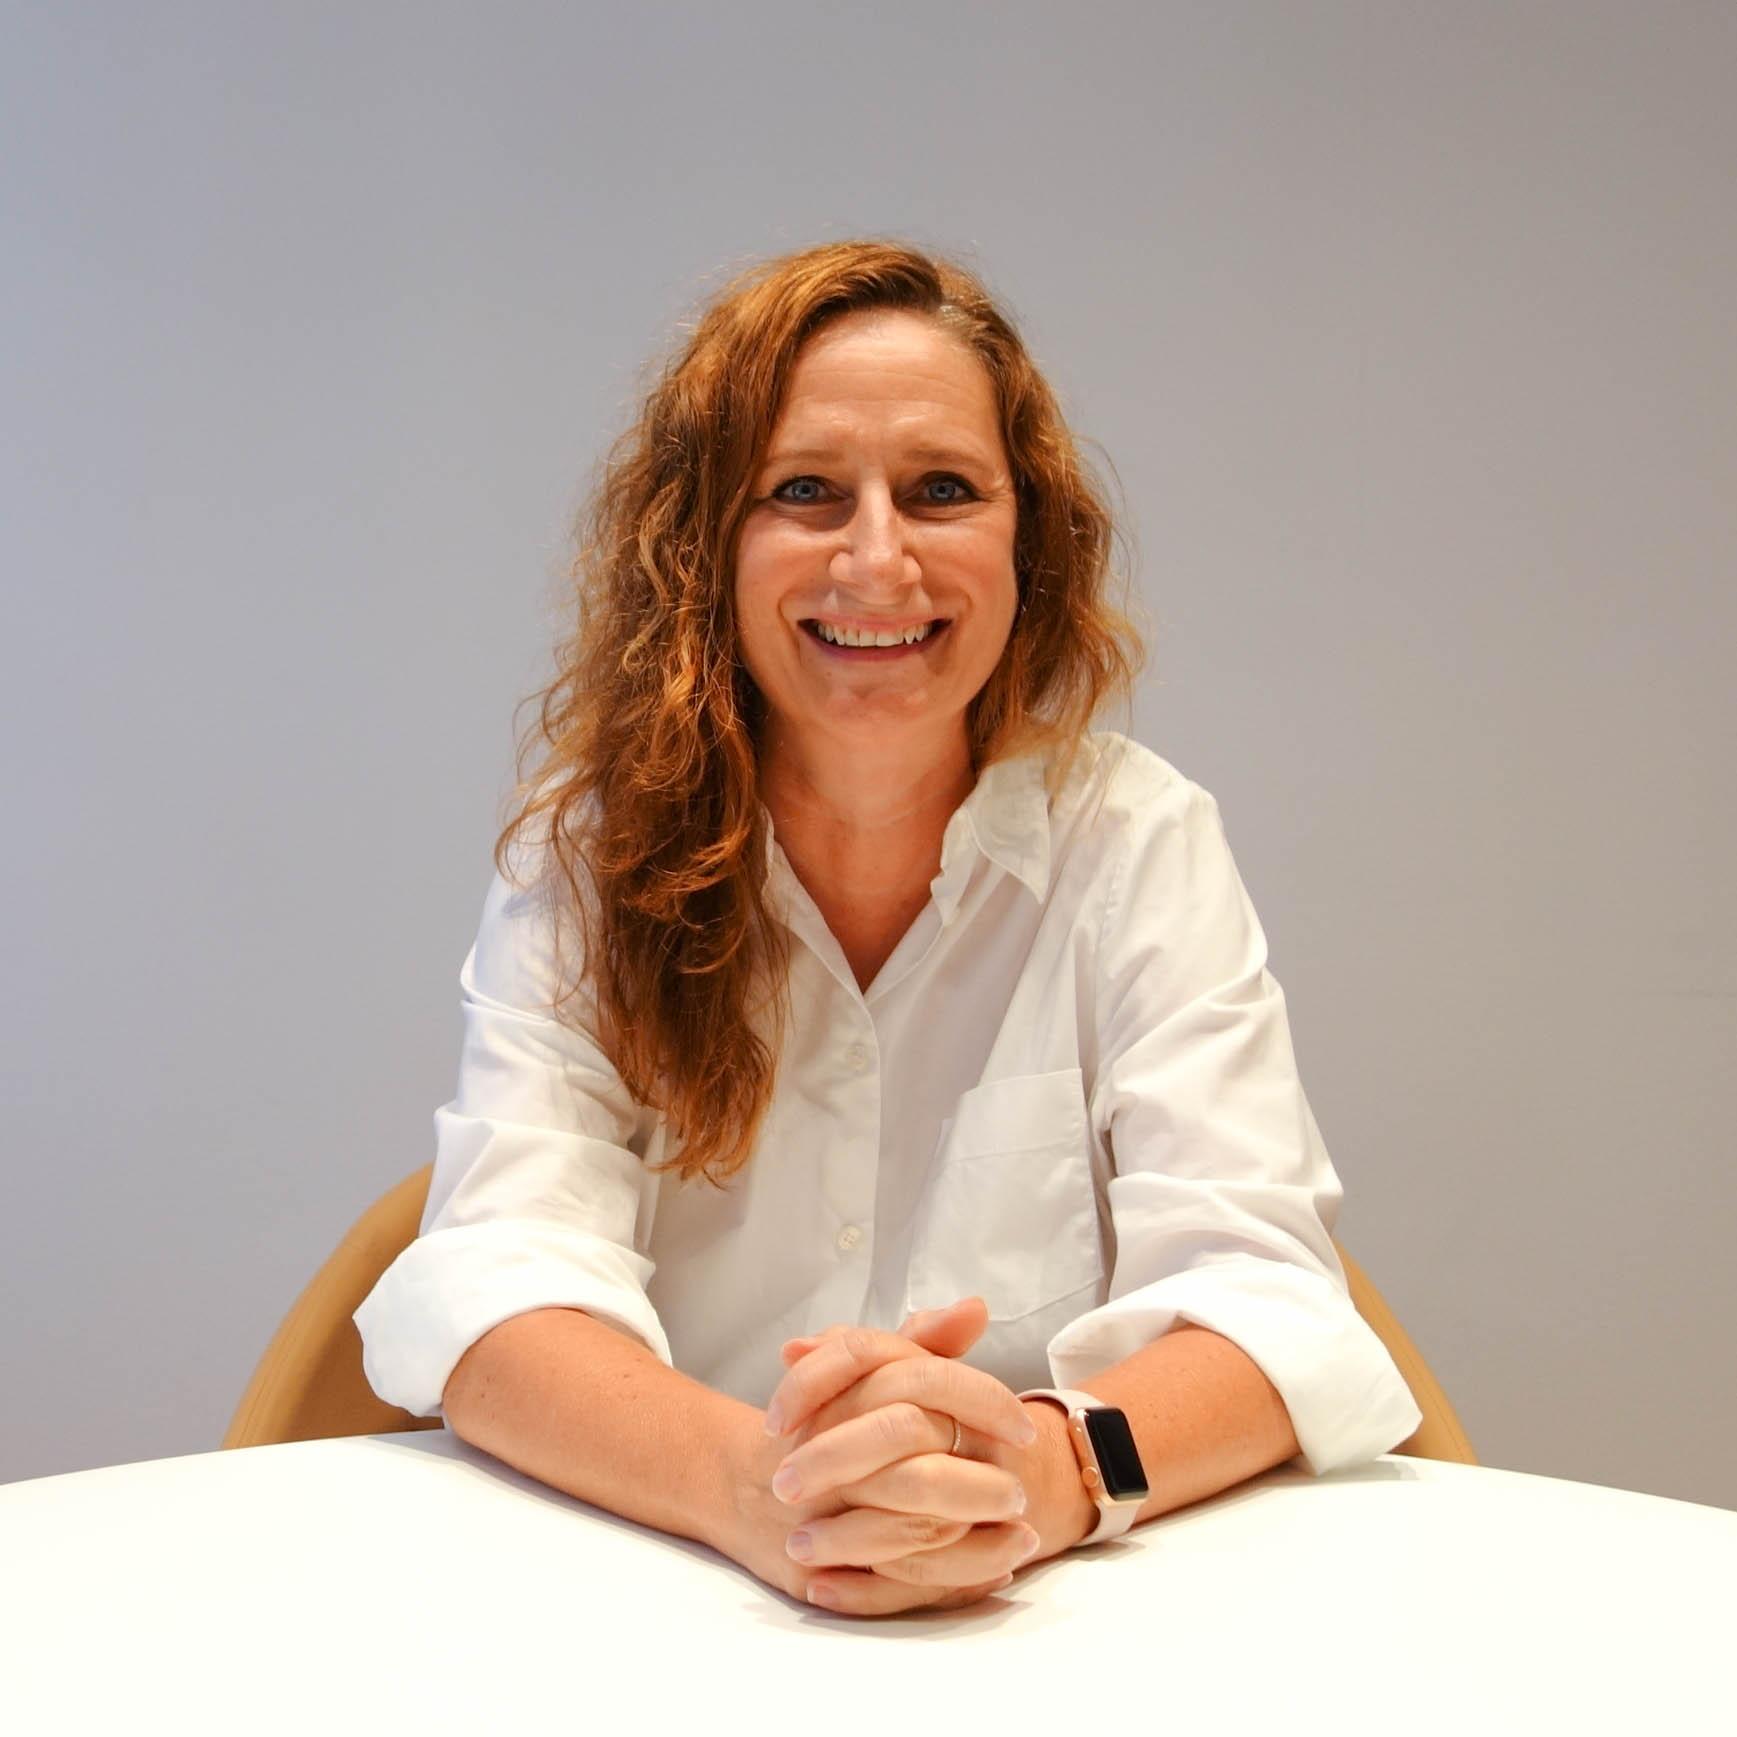 Maria Hammarstedt   Byggnadsingenjör  maria.hammarstedt@elindersten.se +46(0)73-440 29 99